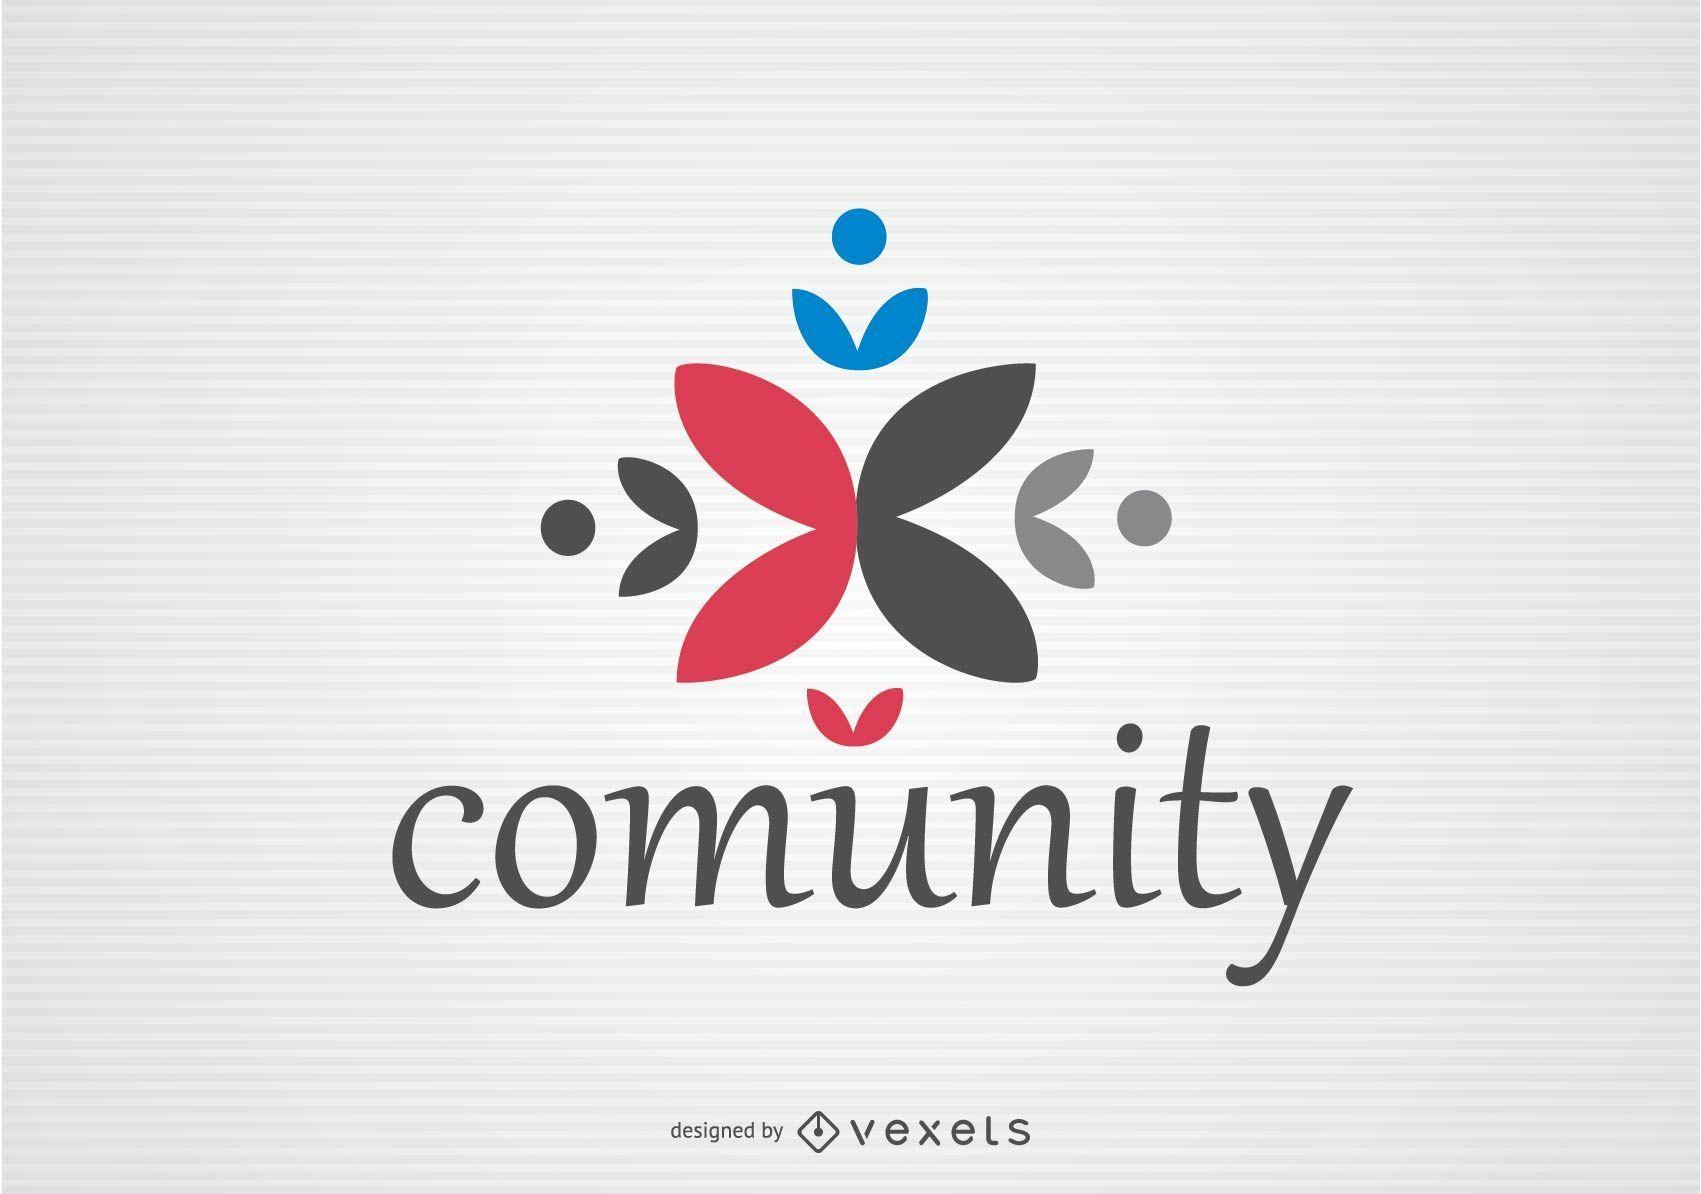 Community team logo